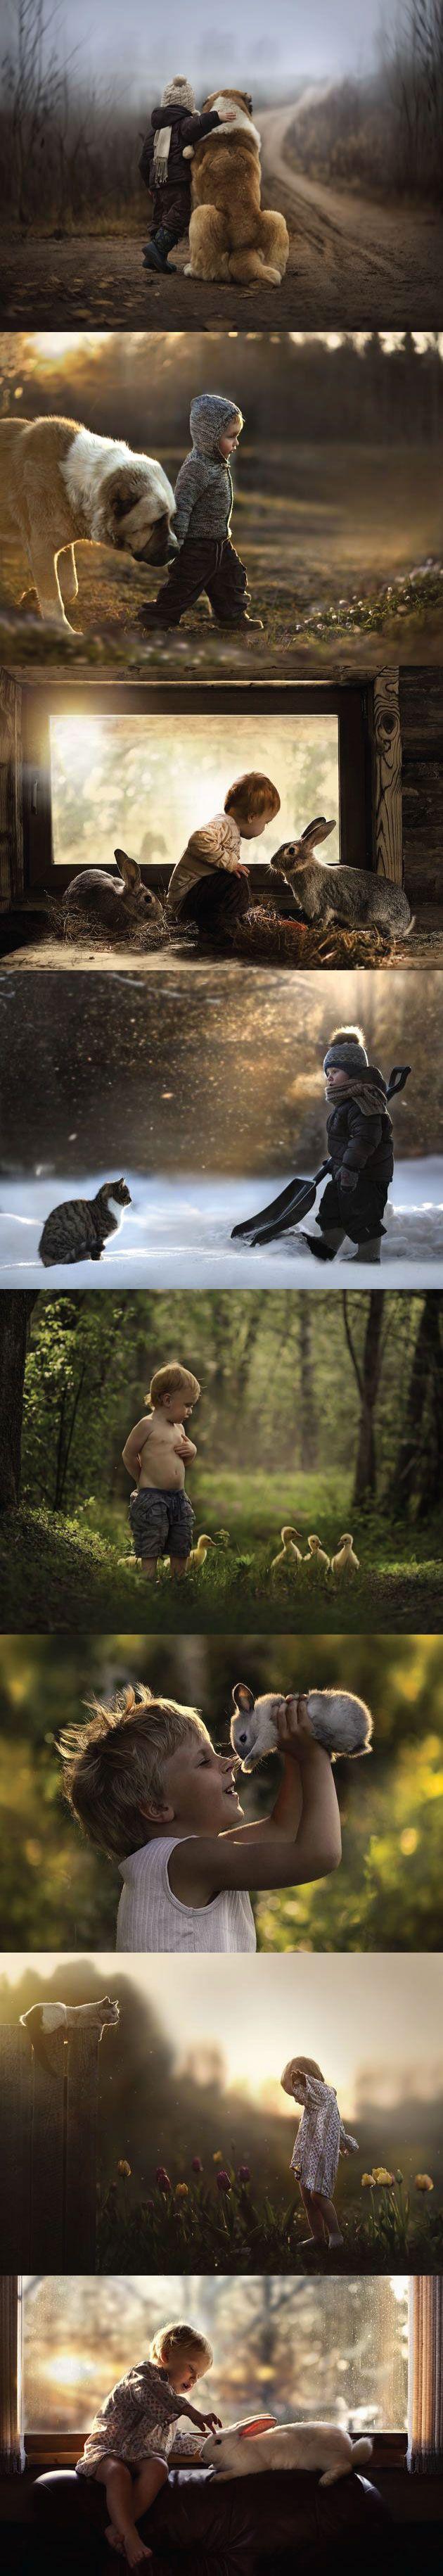 Russian photographer Elena Shumilova's shots of her two sons